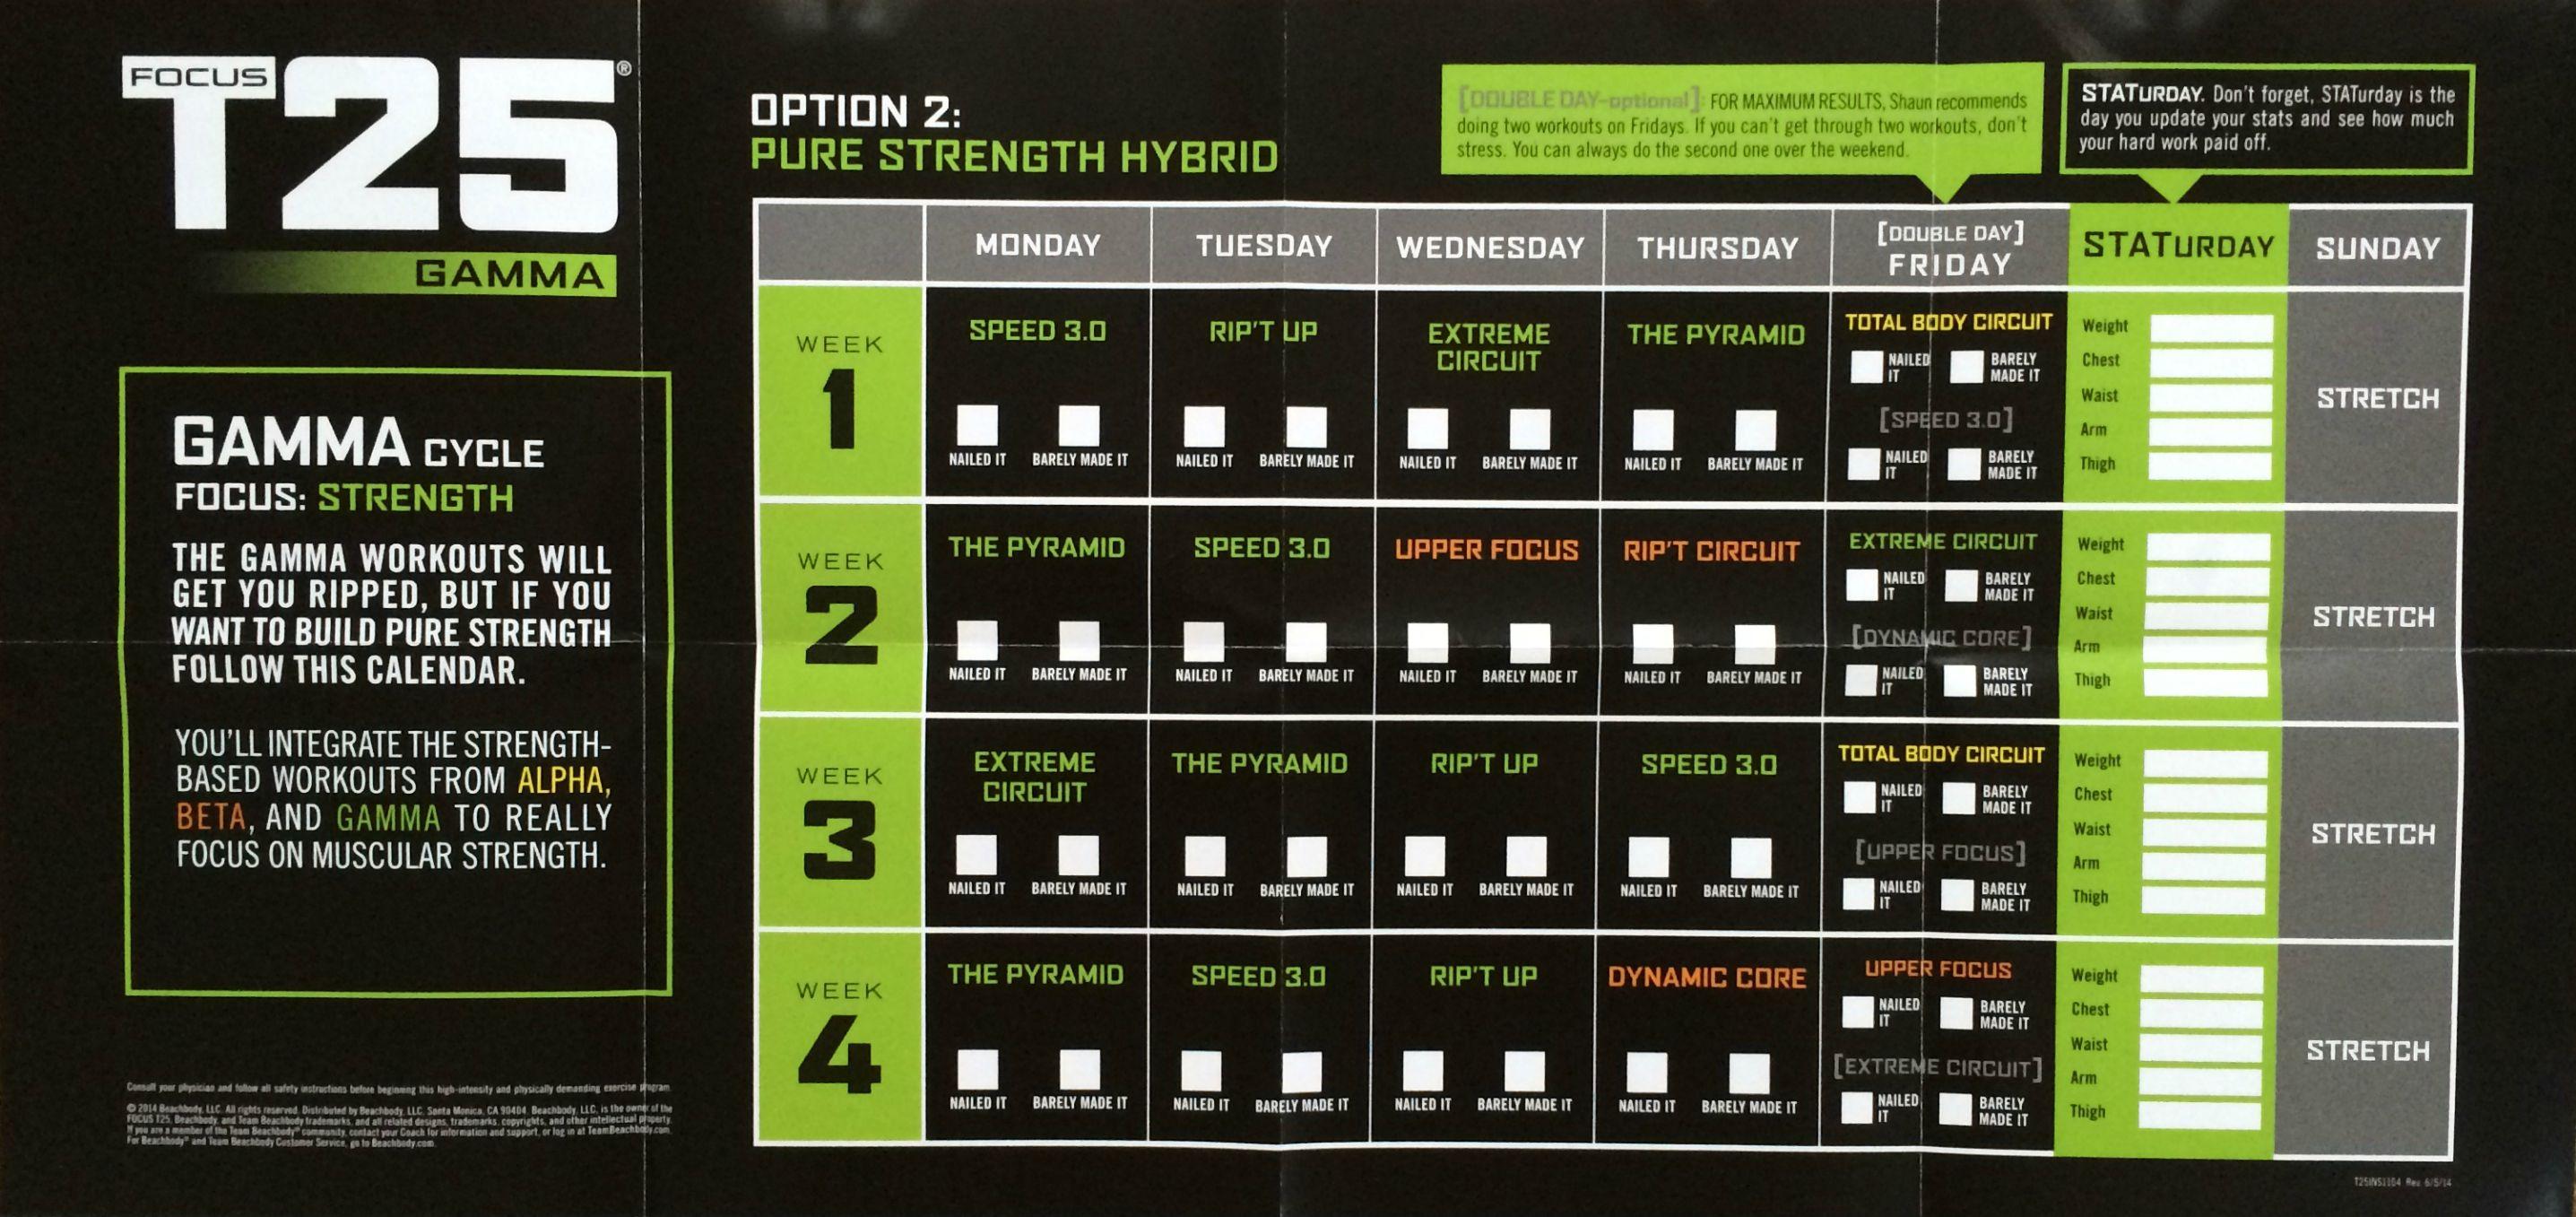 P90x3 T25 Hybrid Workout Schedule Eoua Blog - Newwallpaperjdi co